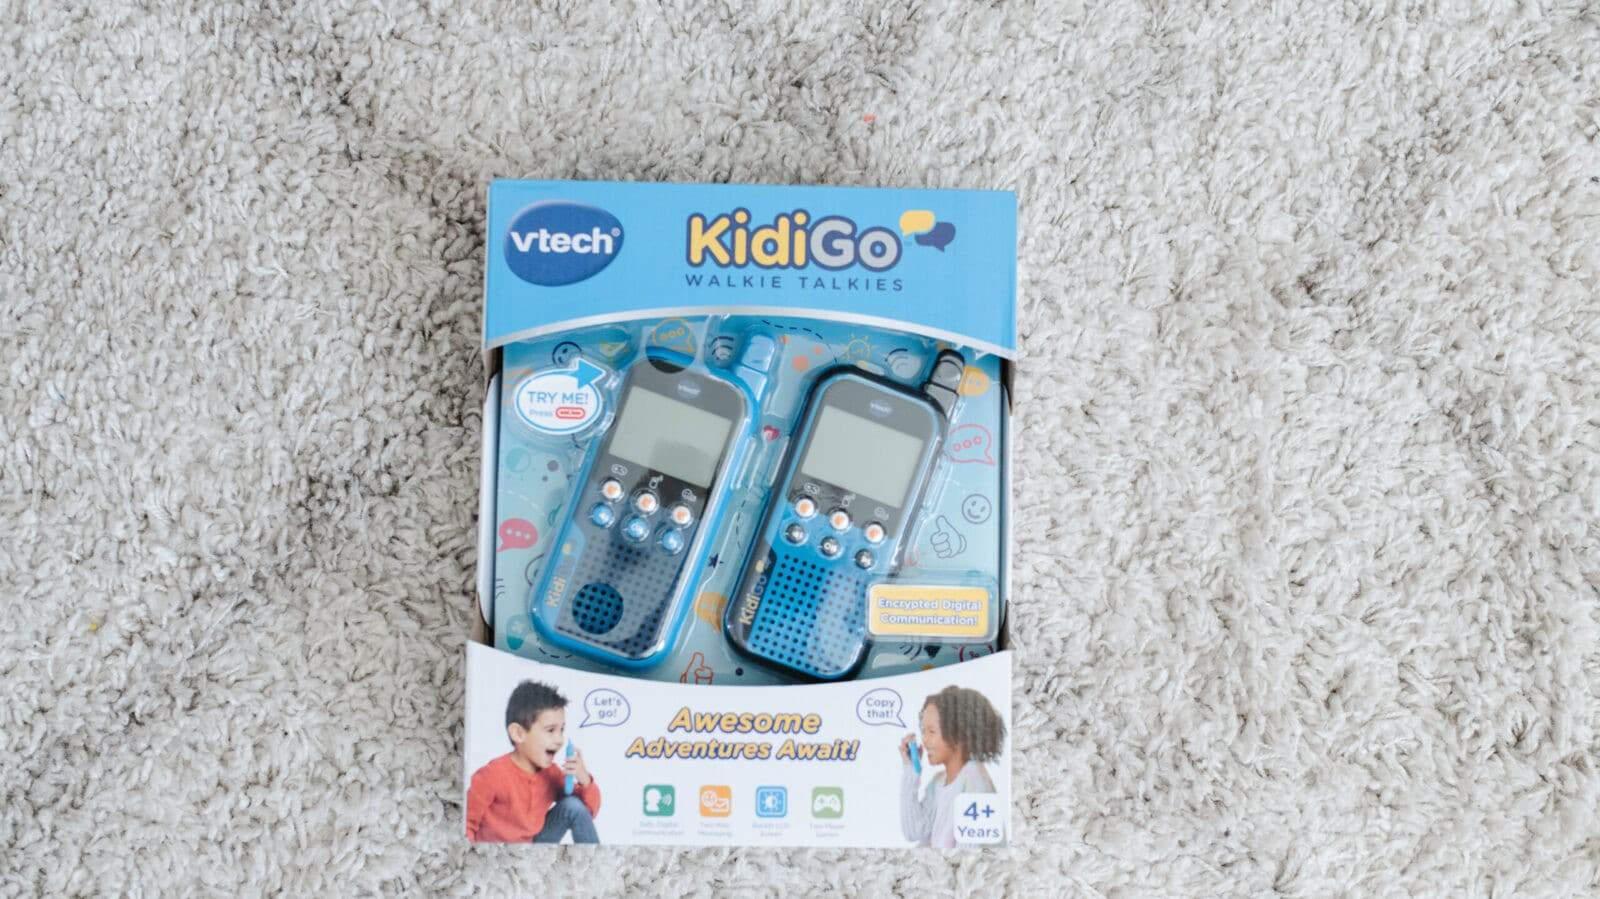 VTech KidiGo Walkie Talkies